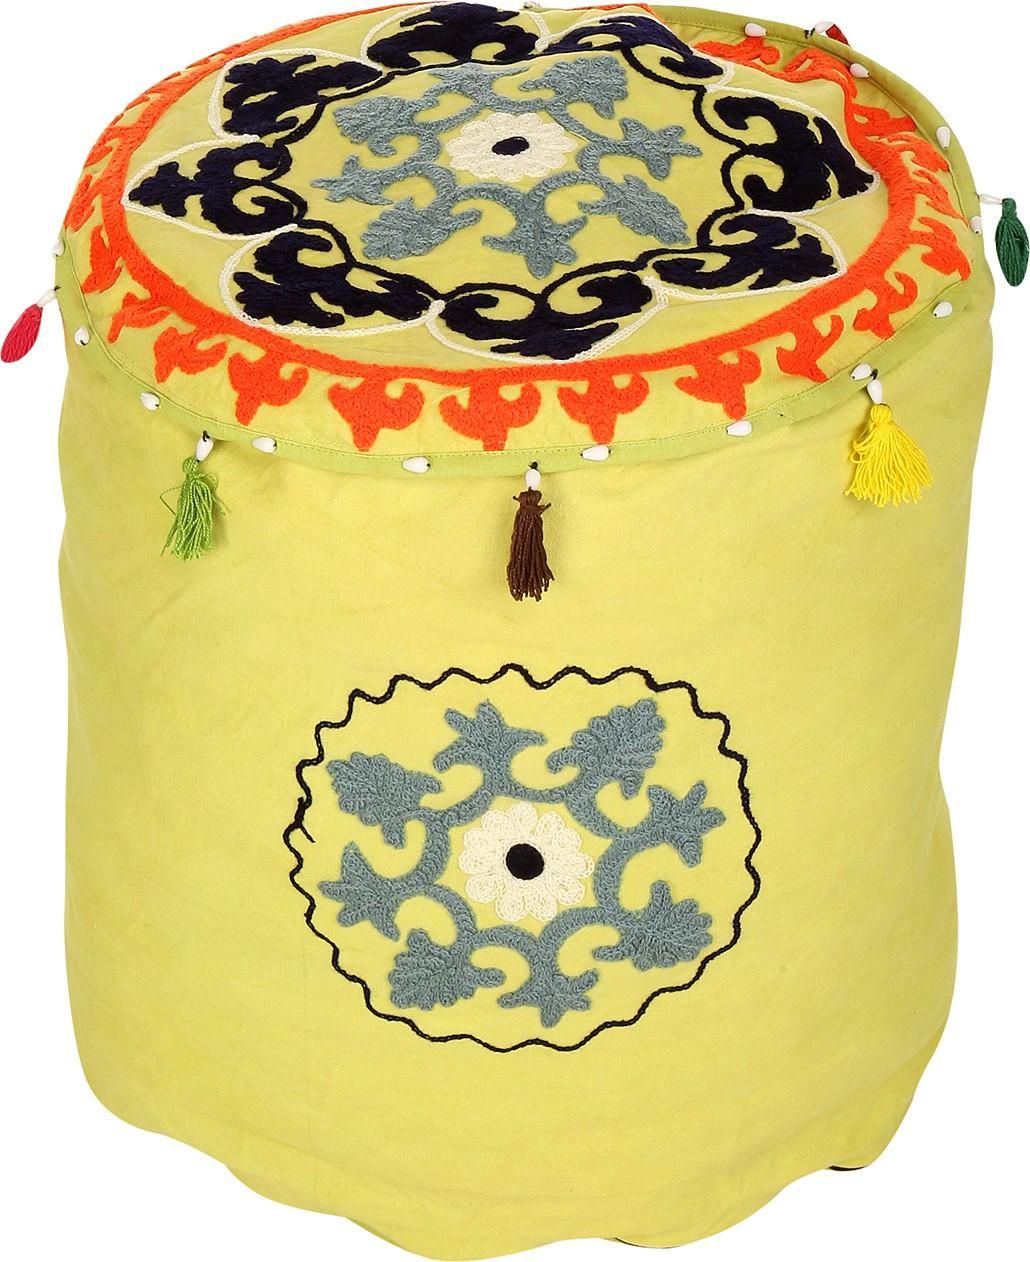 Rajrang Fabric Pouf(Finish Color - Parrot Green)   Furniture  (Rajrang)